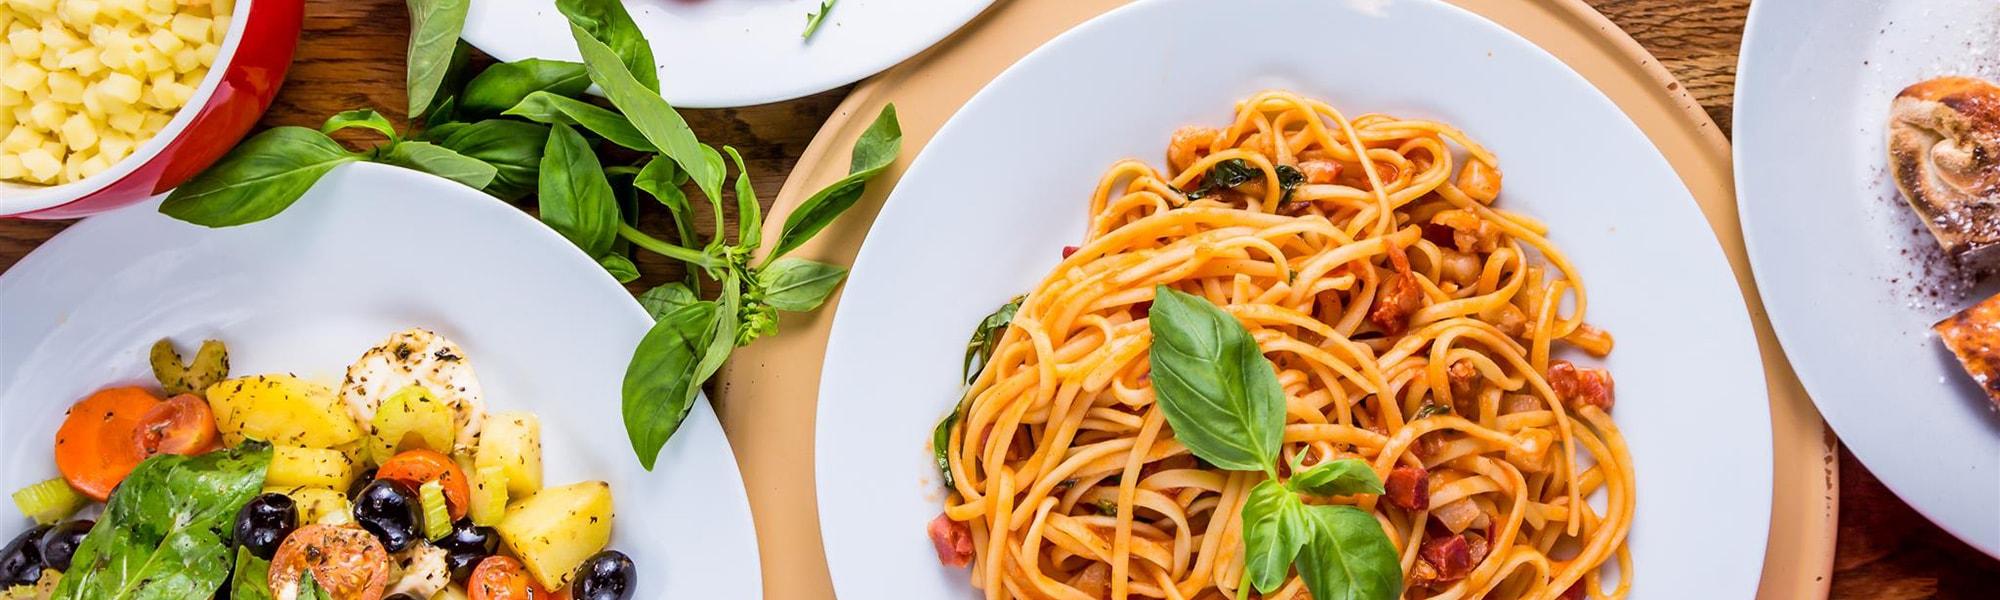 foodpanda offers special deals for DBS cardholders! | foodpanda